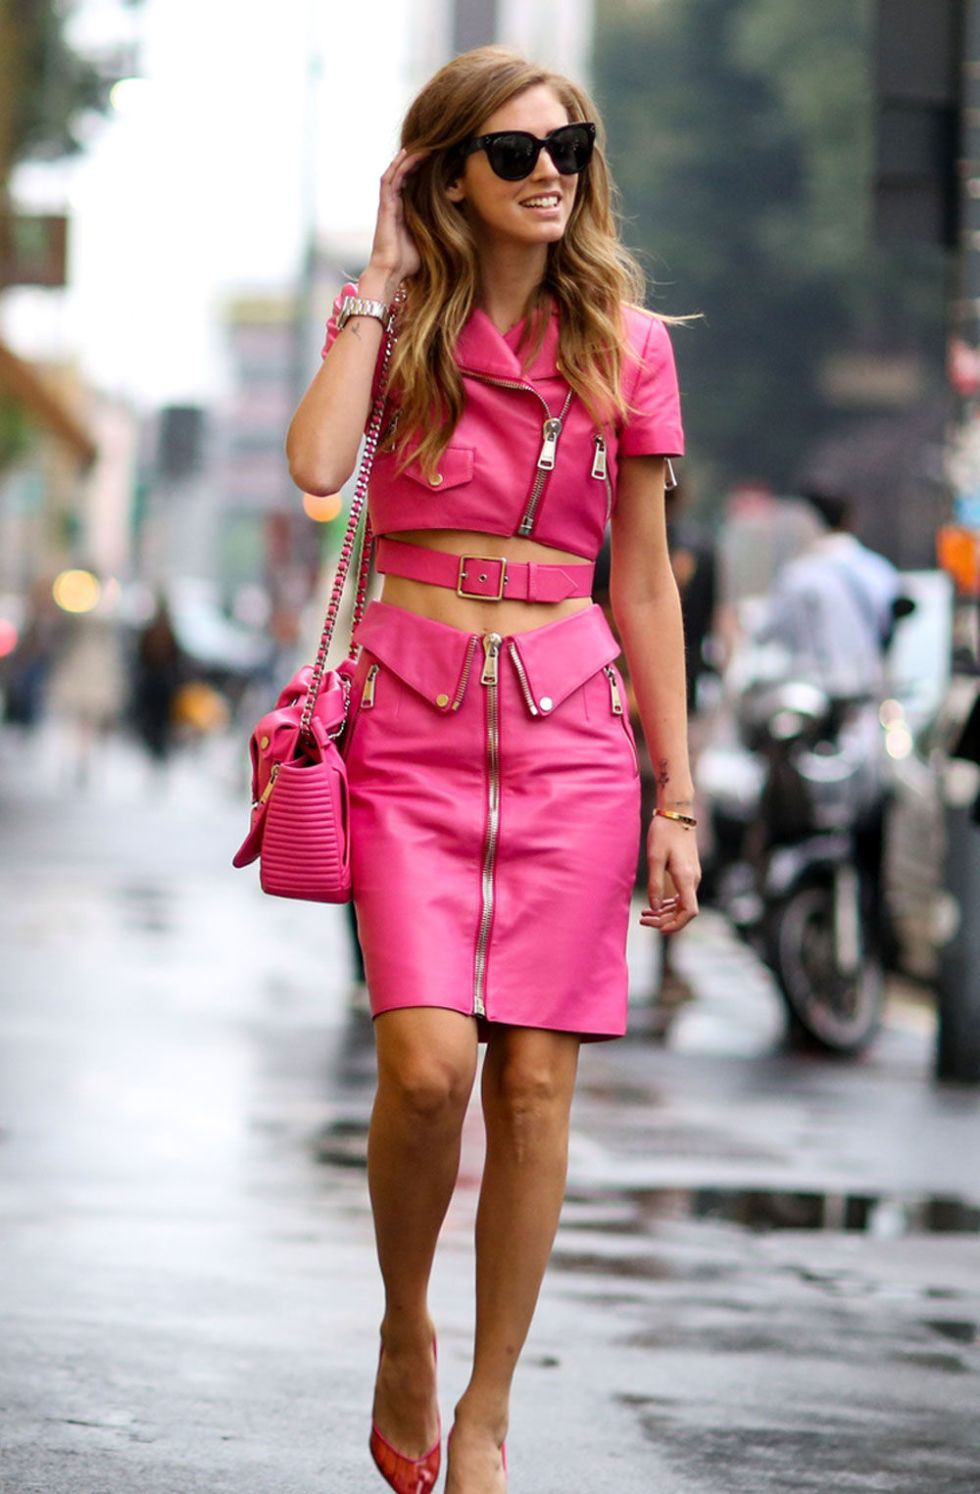 25 Fashion Risks Worth Taking